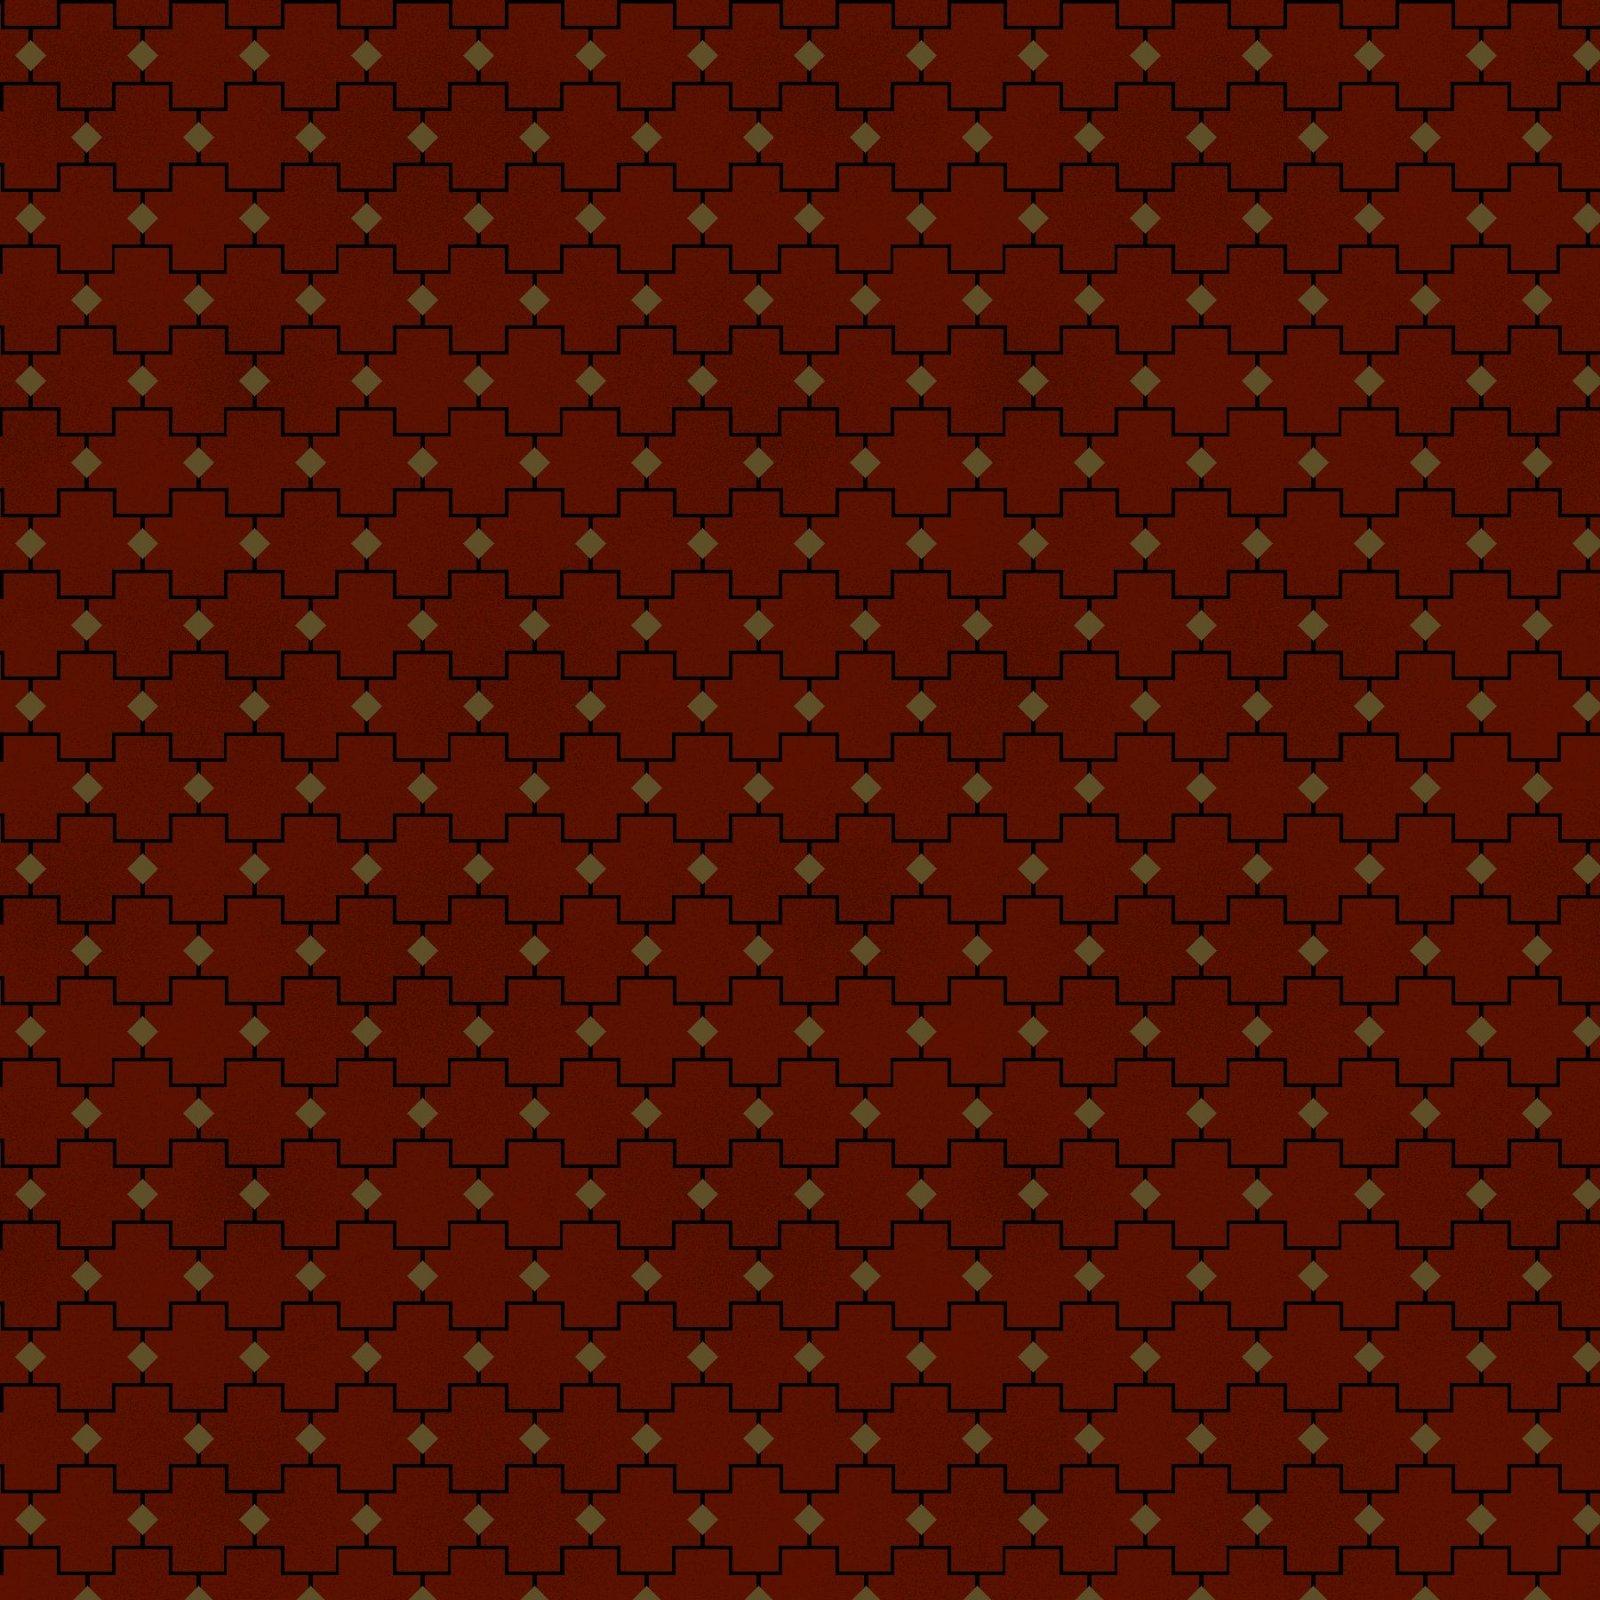 HG-Farmhouse Christmas 9675-88 Red - Geometric